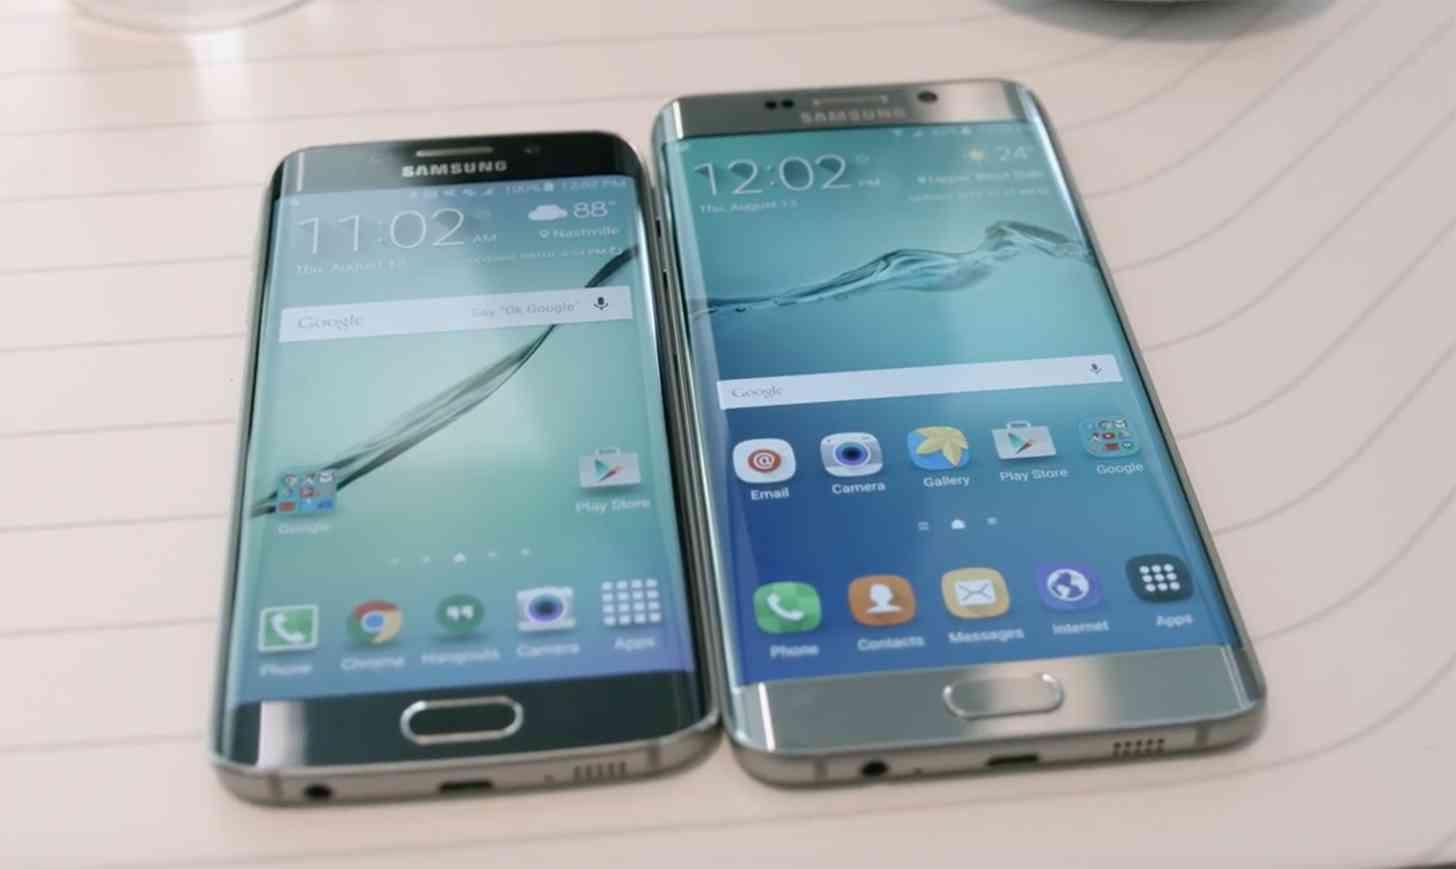 Samsung Galaxy S6 edge, S6 edge+ large